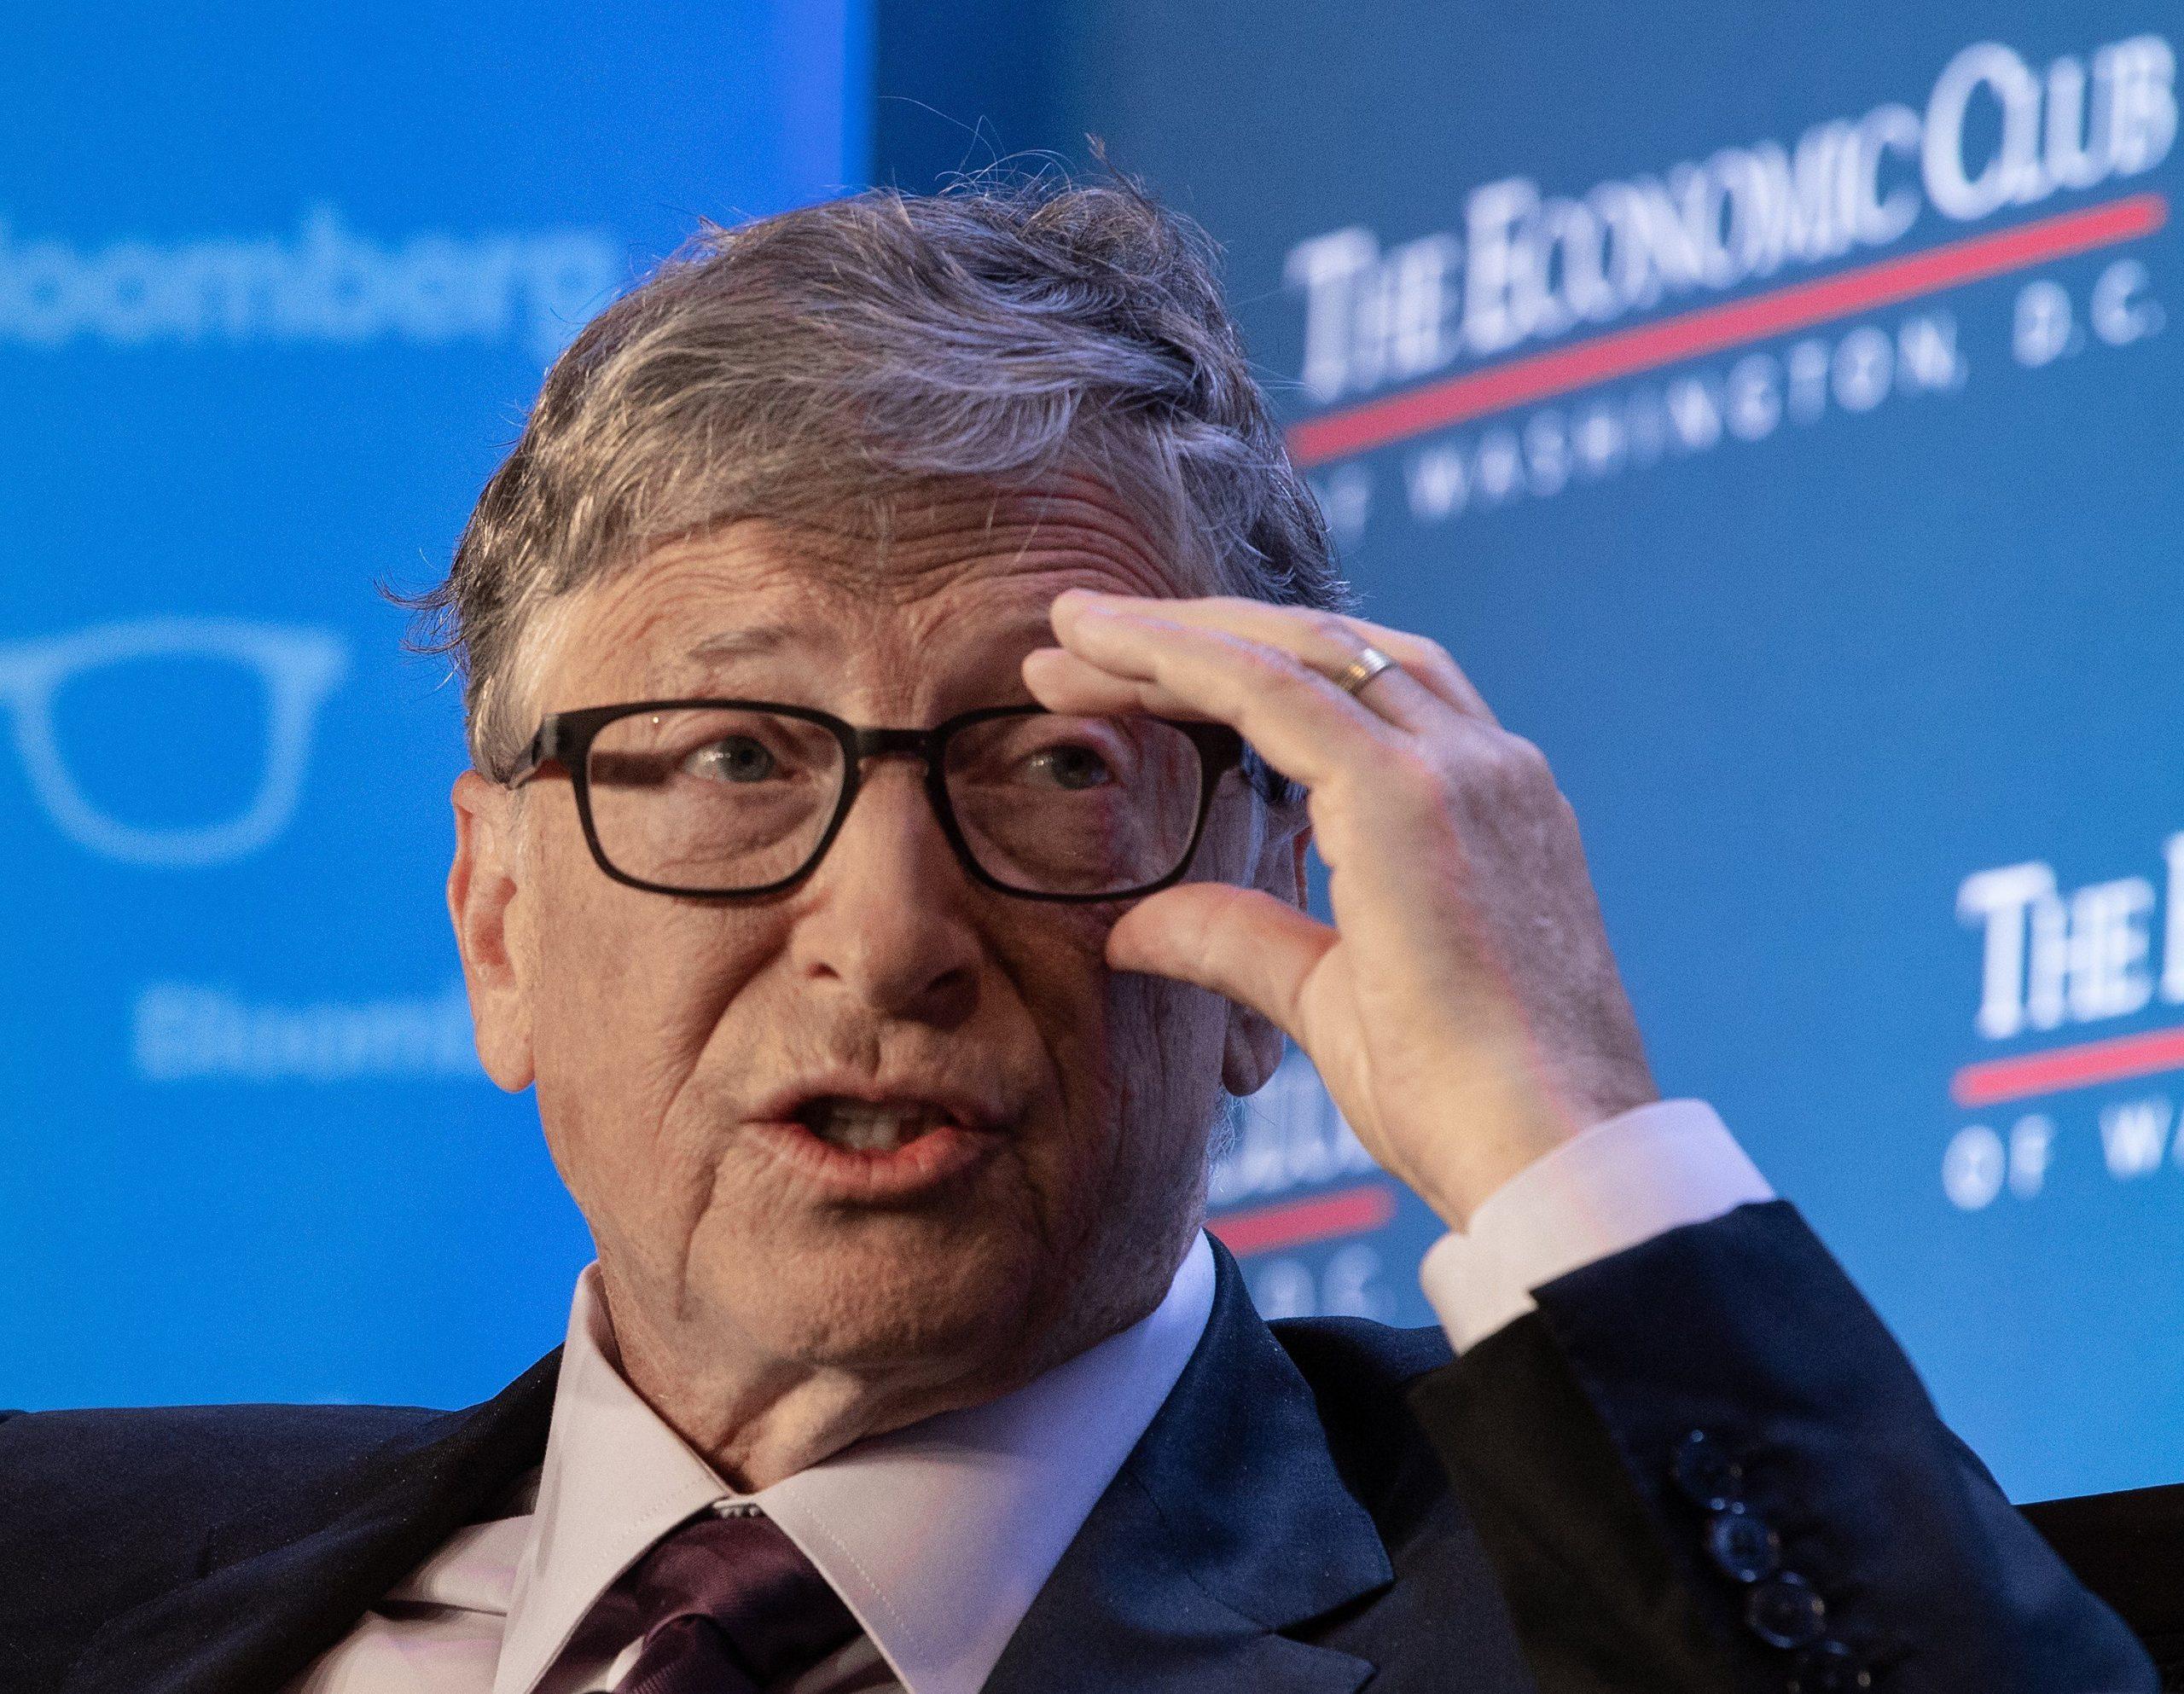 La otra pandemia sobre la que advierte el magnate de Microsoft, Bill Gates